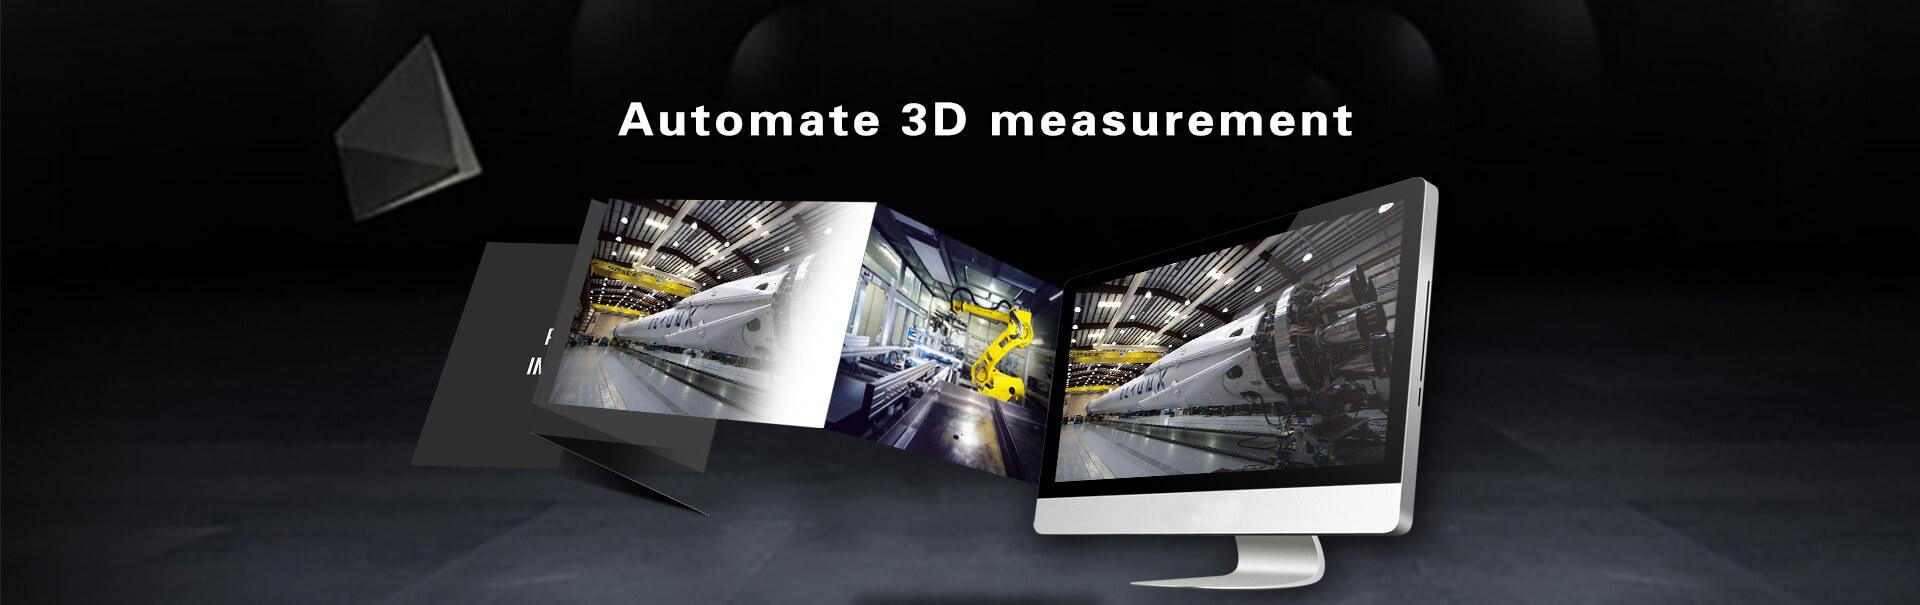 Automated Measurement